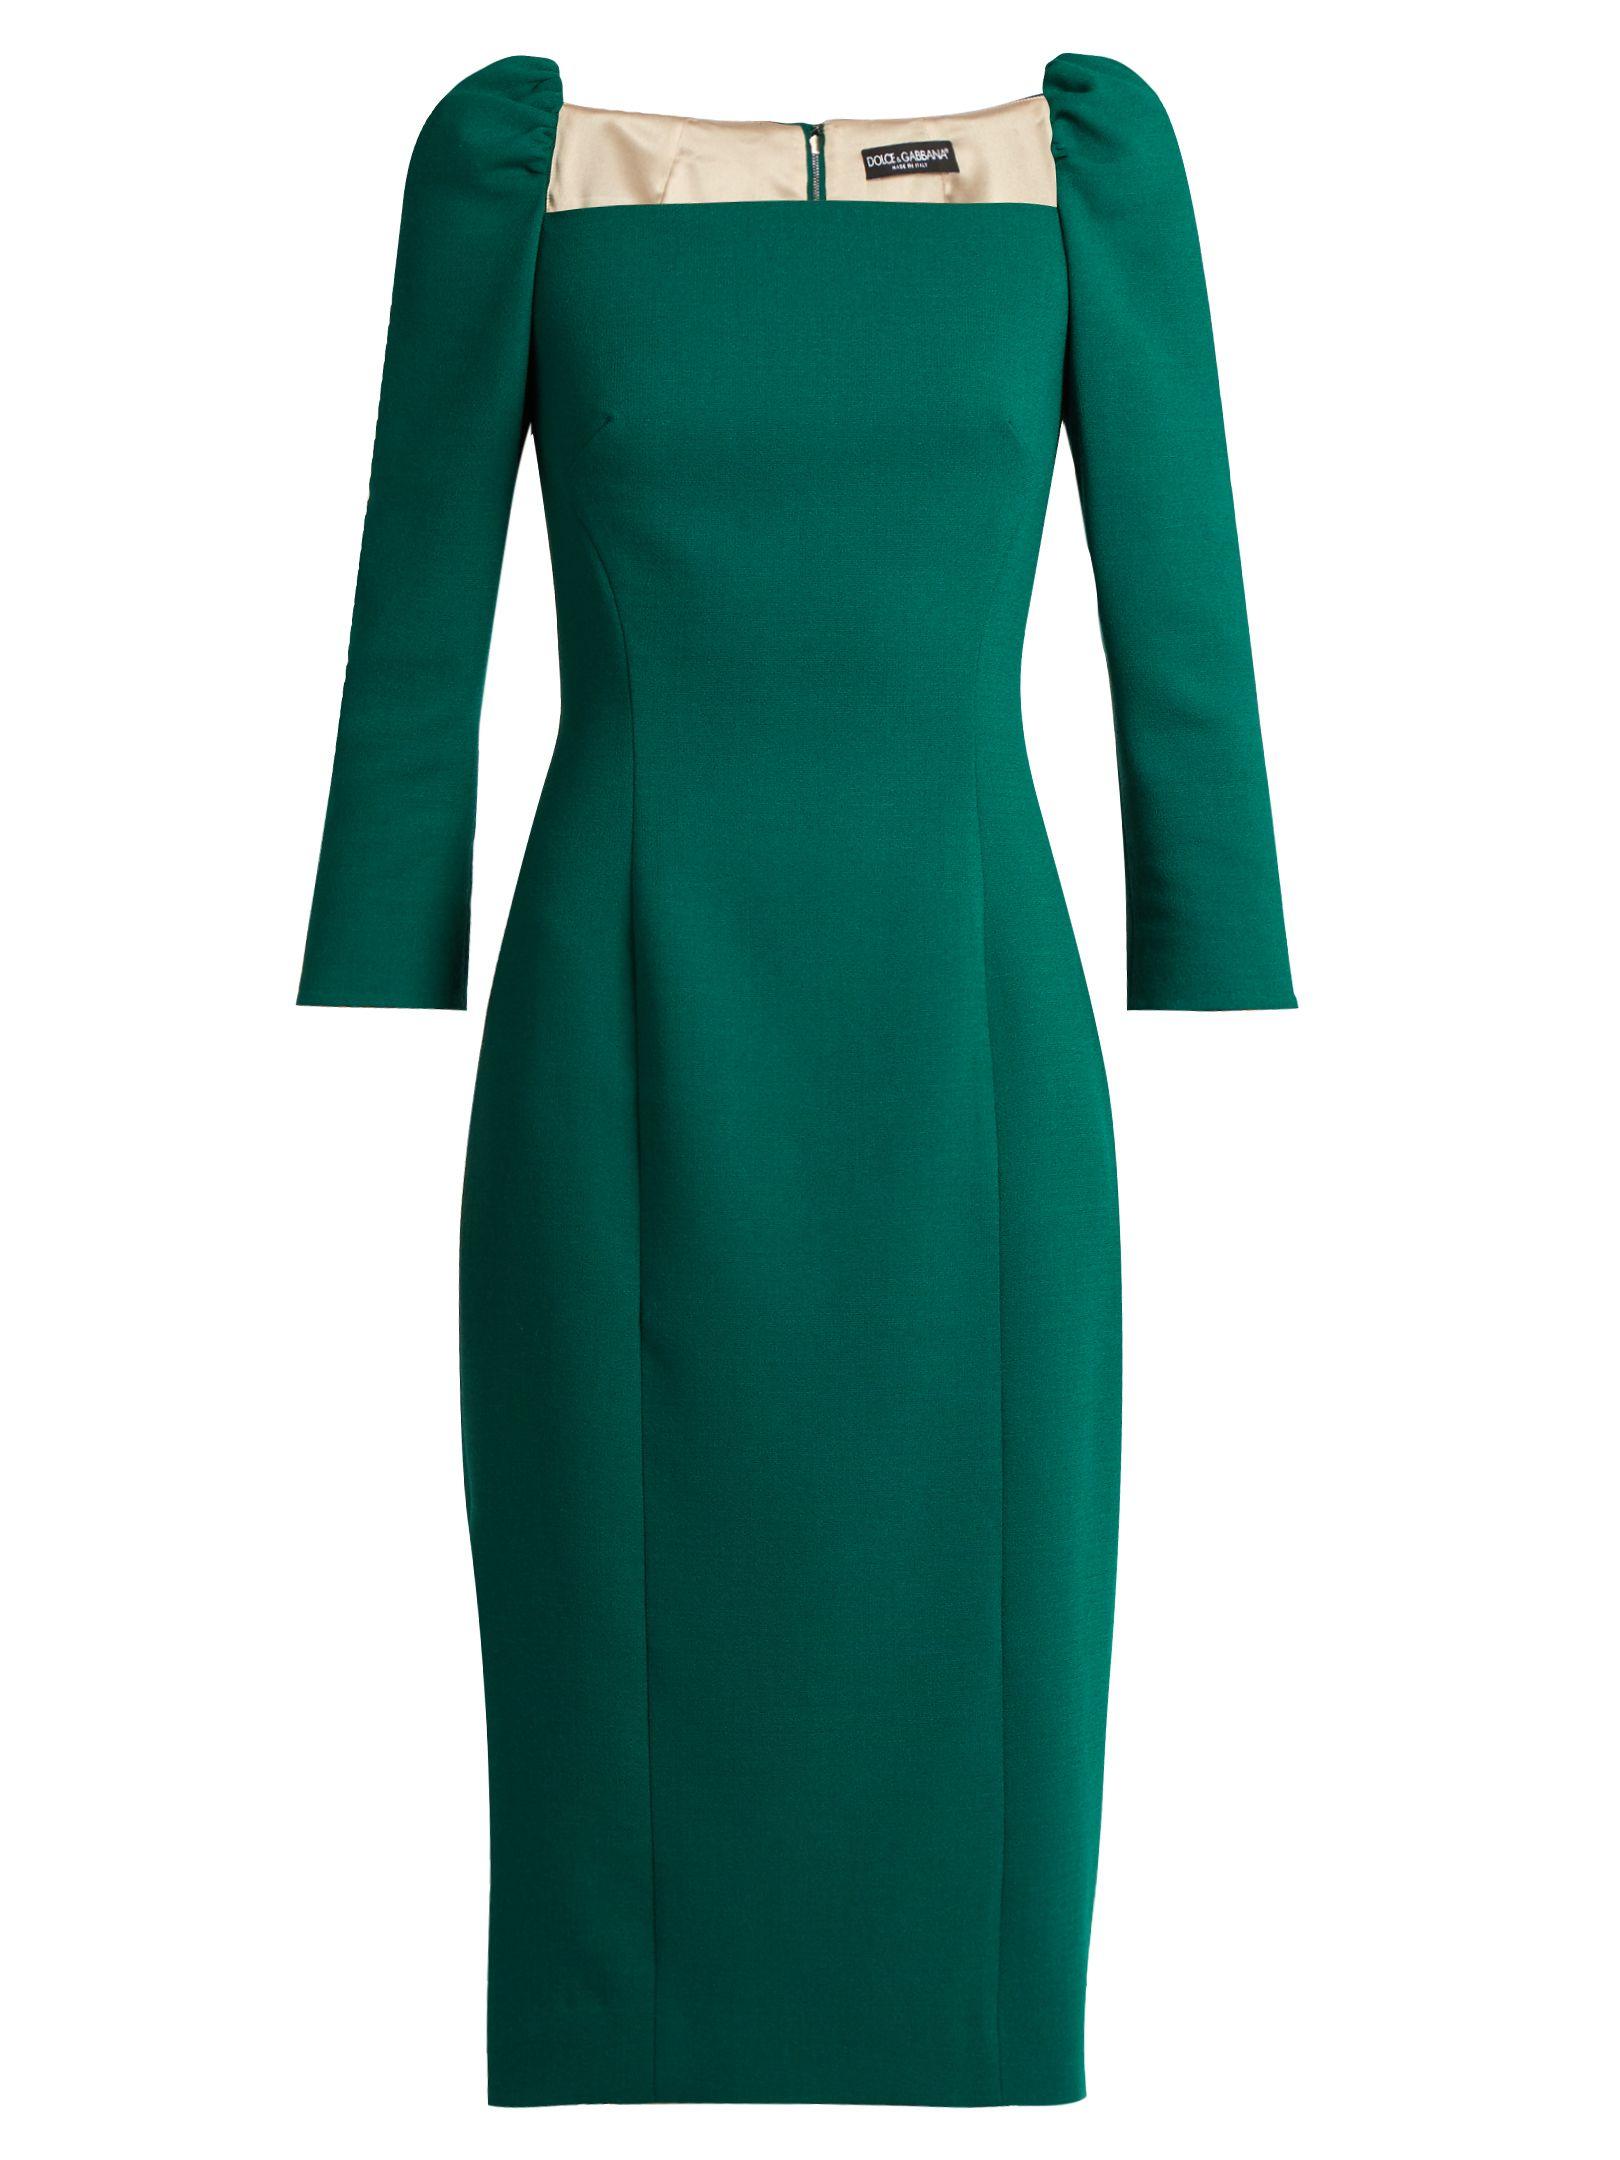 Square Neck Stretch Wool Pencil Dress Dolce Amp Gabbana Matchesfashion Com Uk Pencil Dress Dresses Glamorous Dresses [ 2160 x 1620 Pixel ]